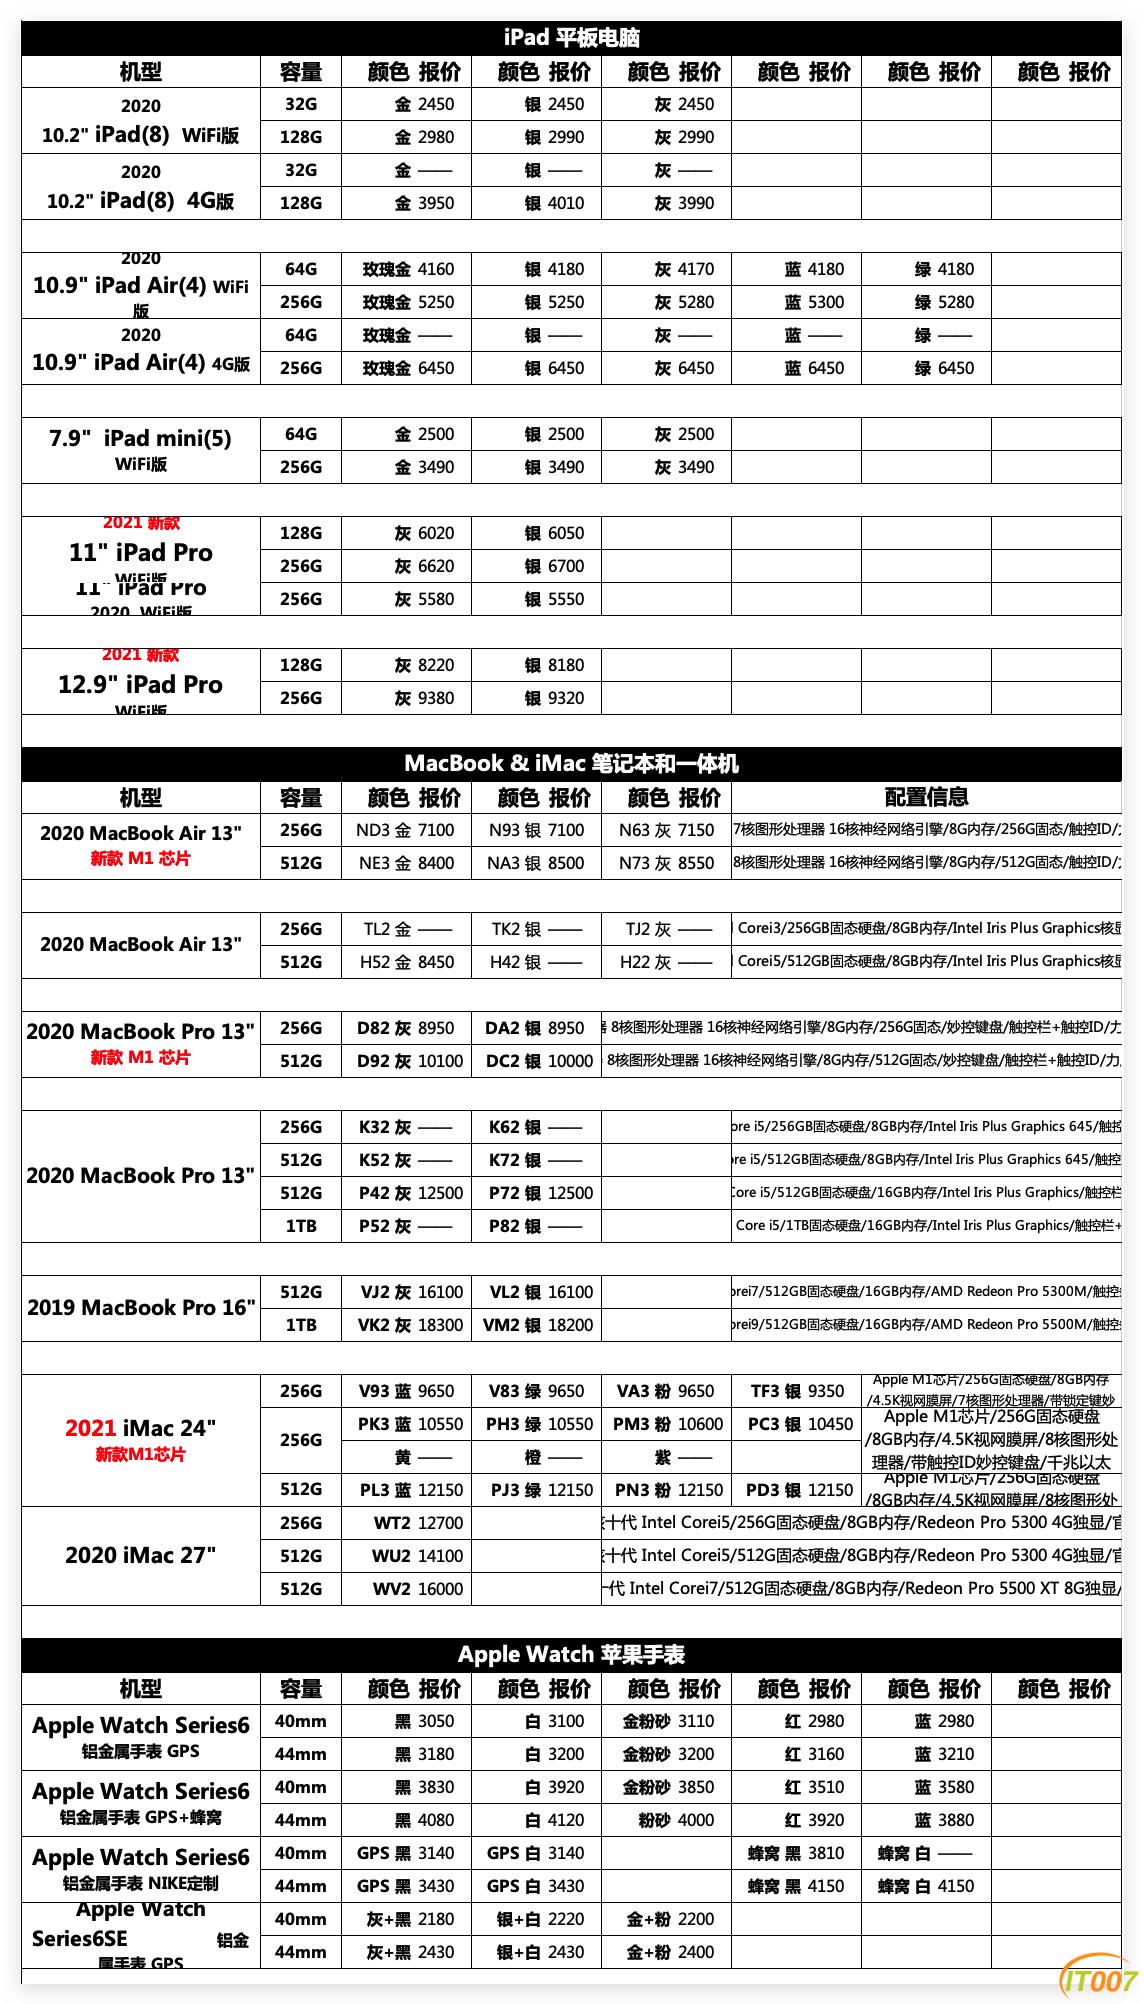 Xnip2021-06-21_14-29-00.png